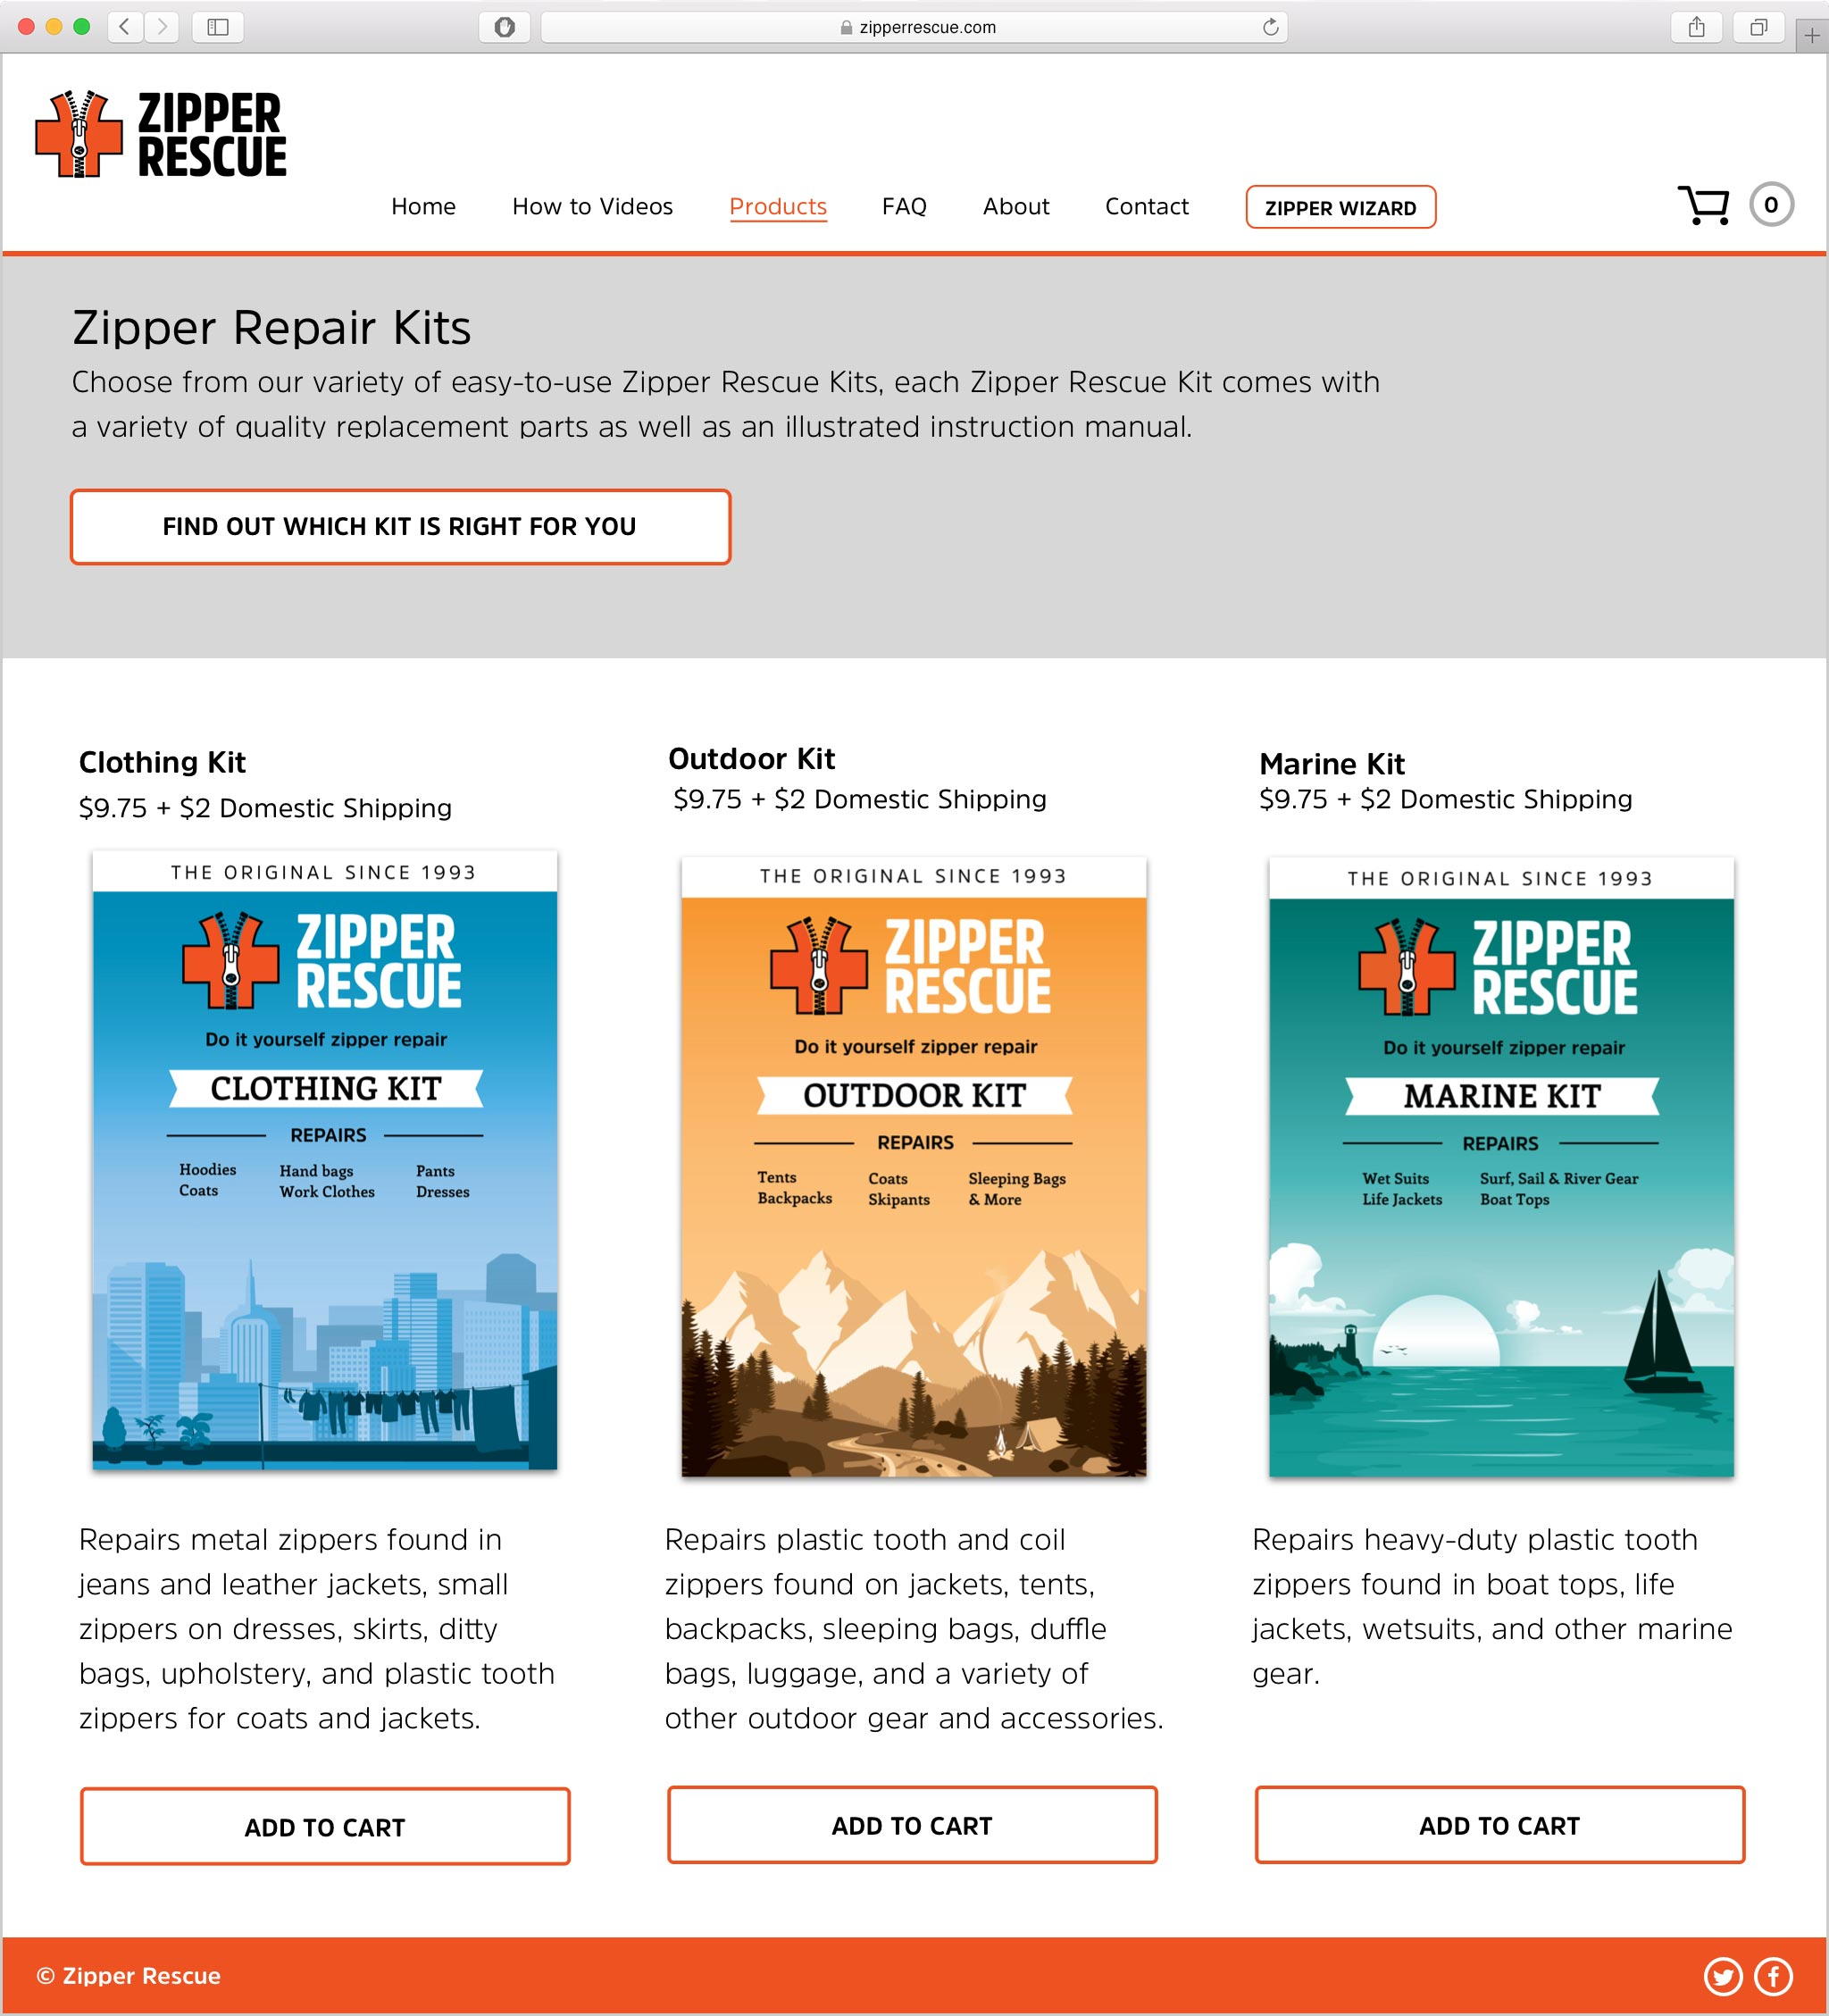 Portfolio_2017_Design_Zipper_Rescue_Website_Product_2048.jpg